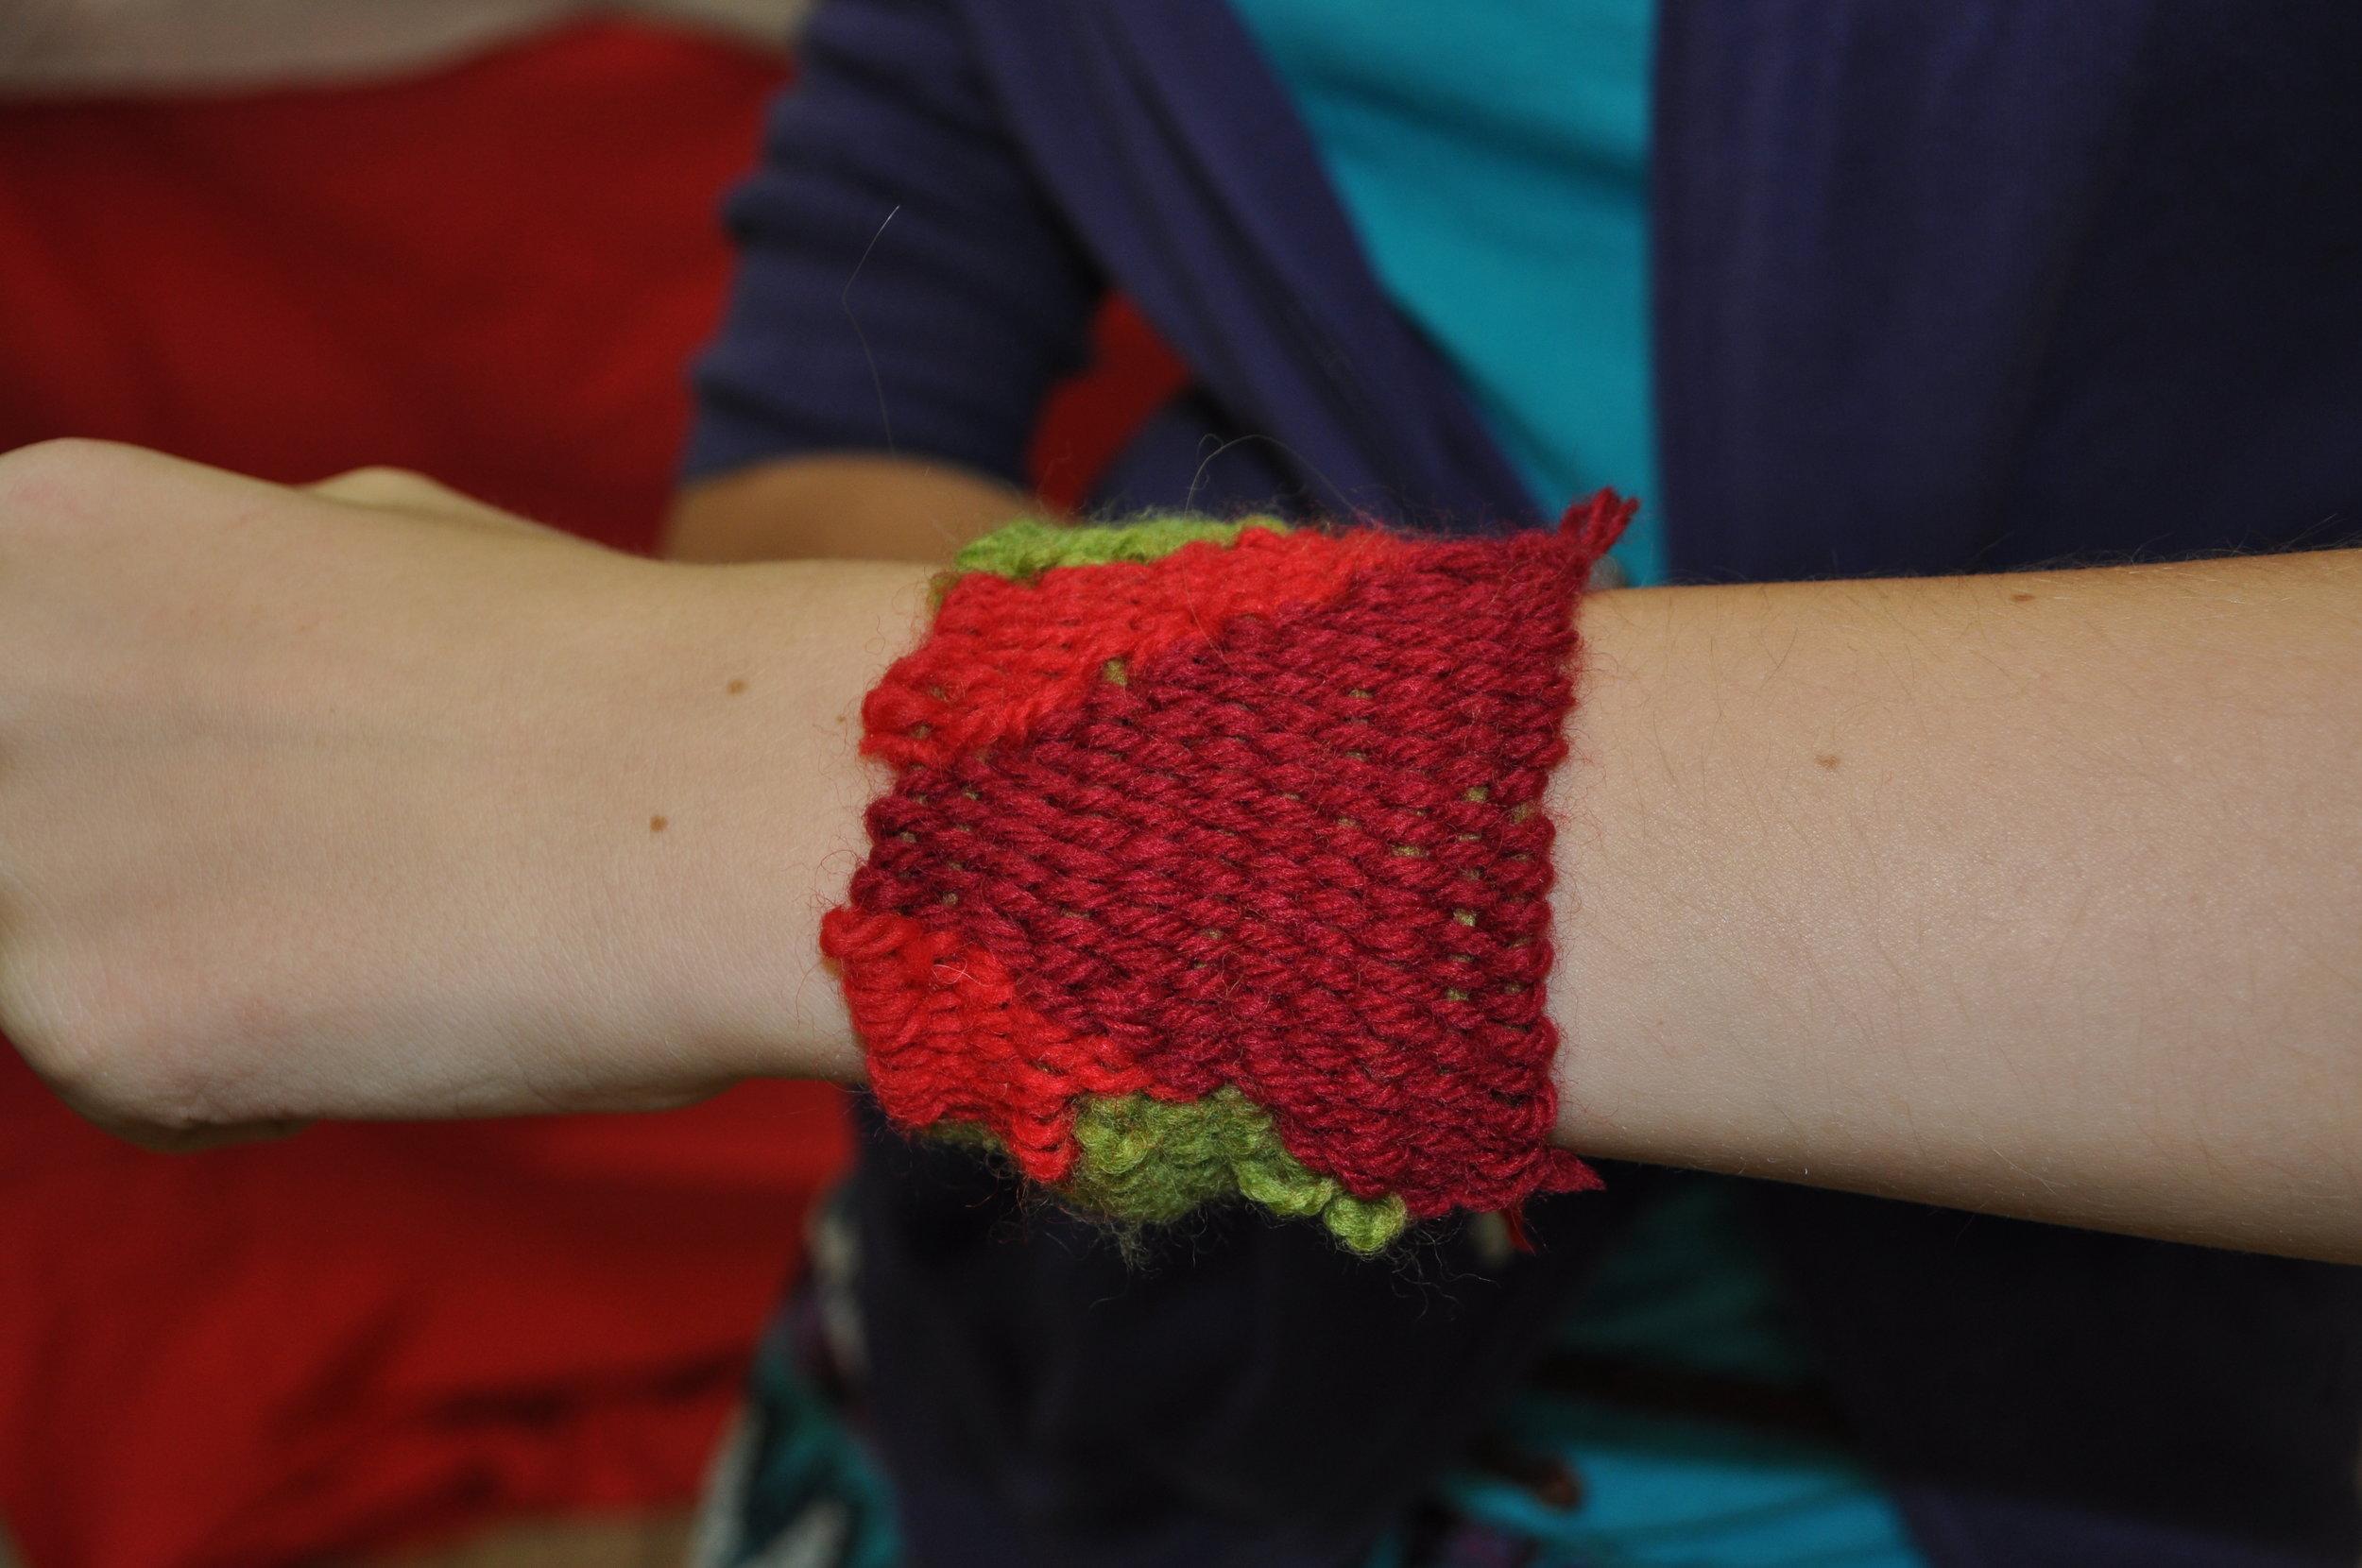 woven-wristband_5076677452_o.jpg